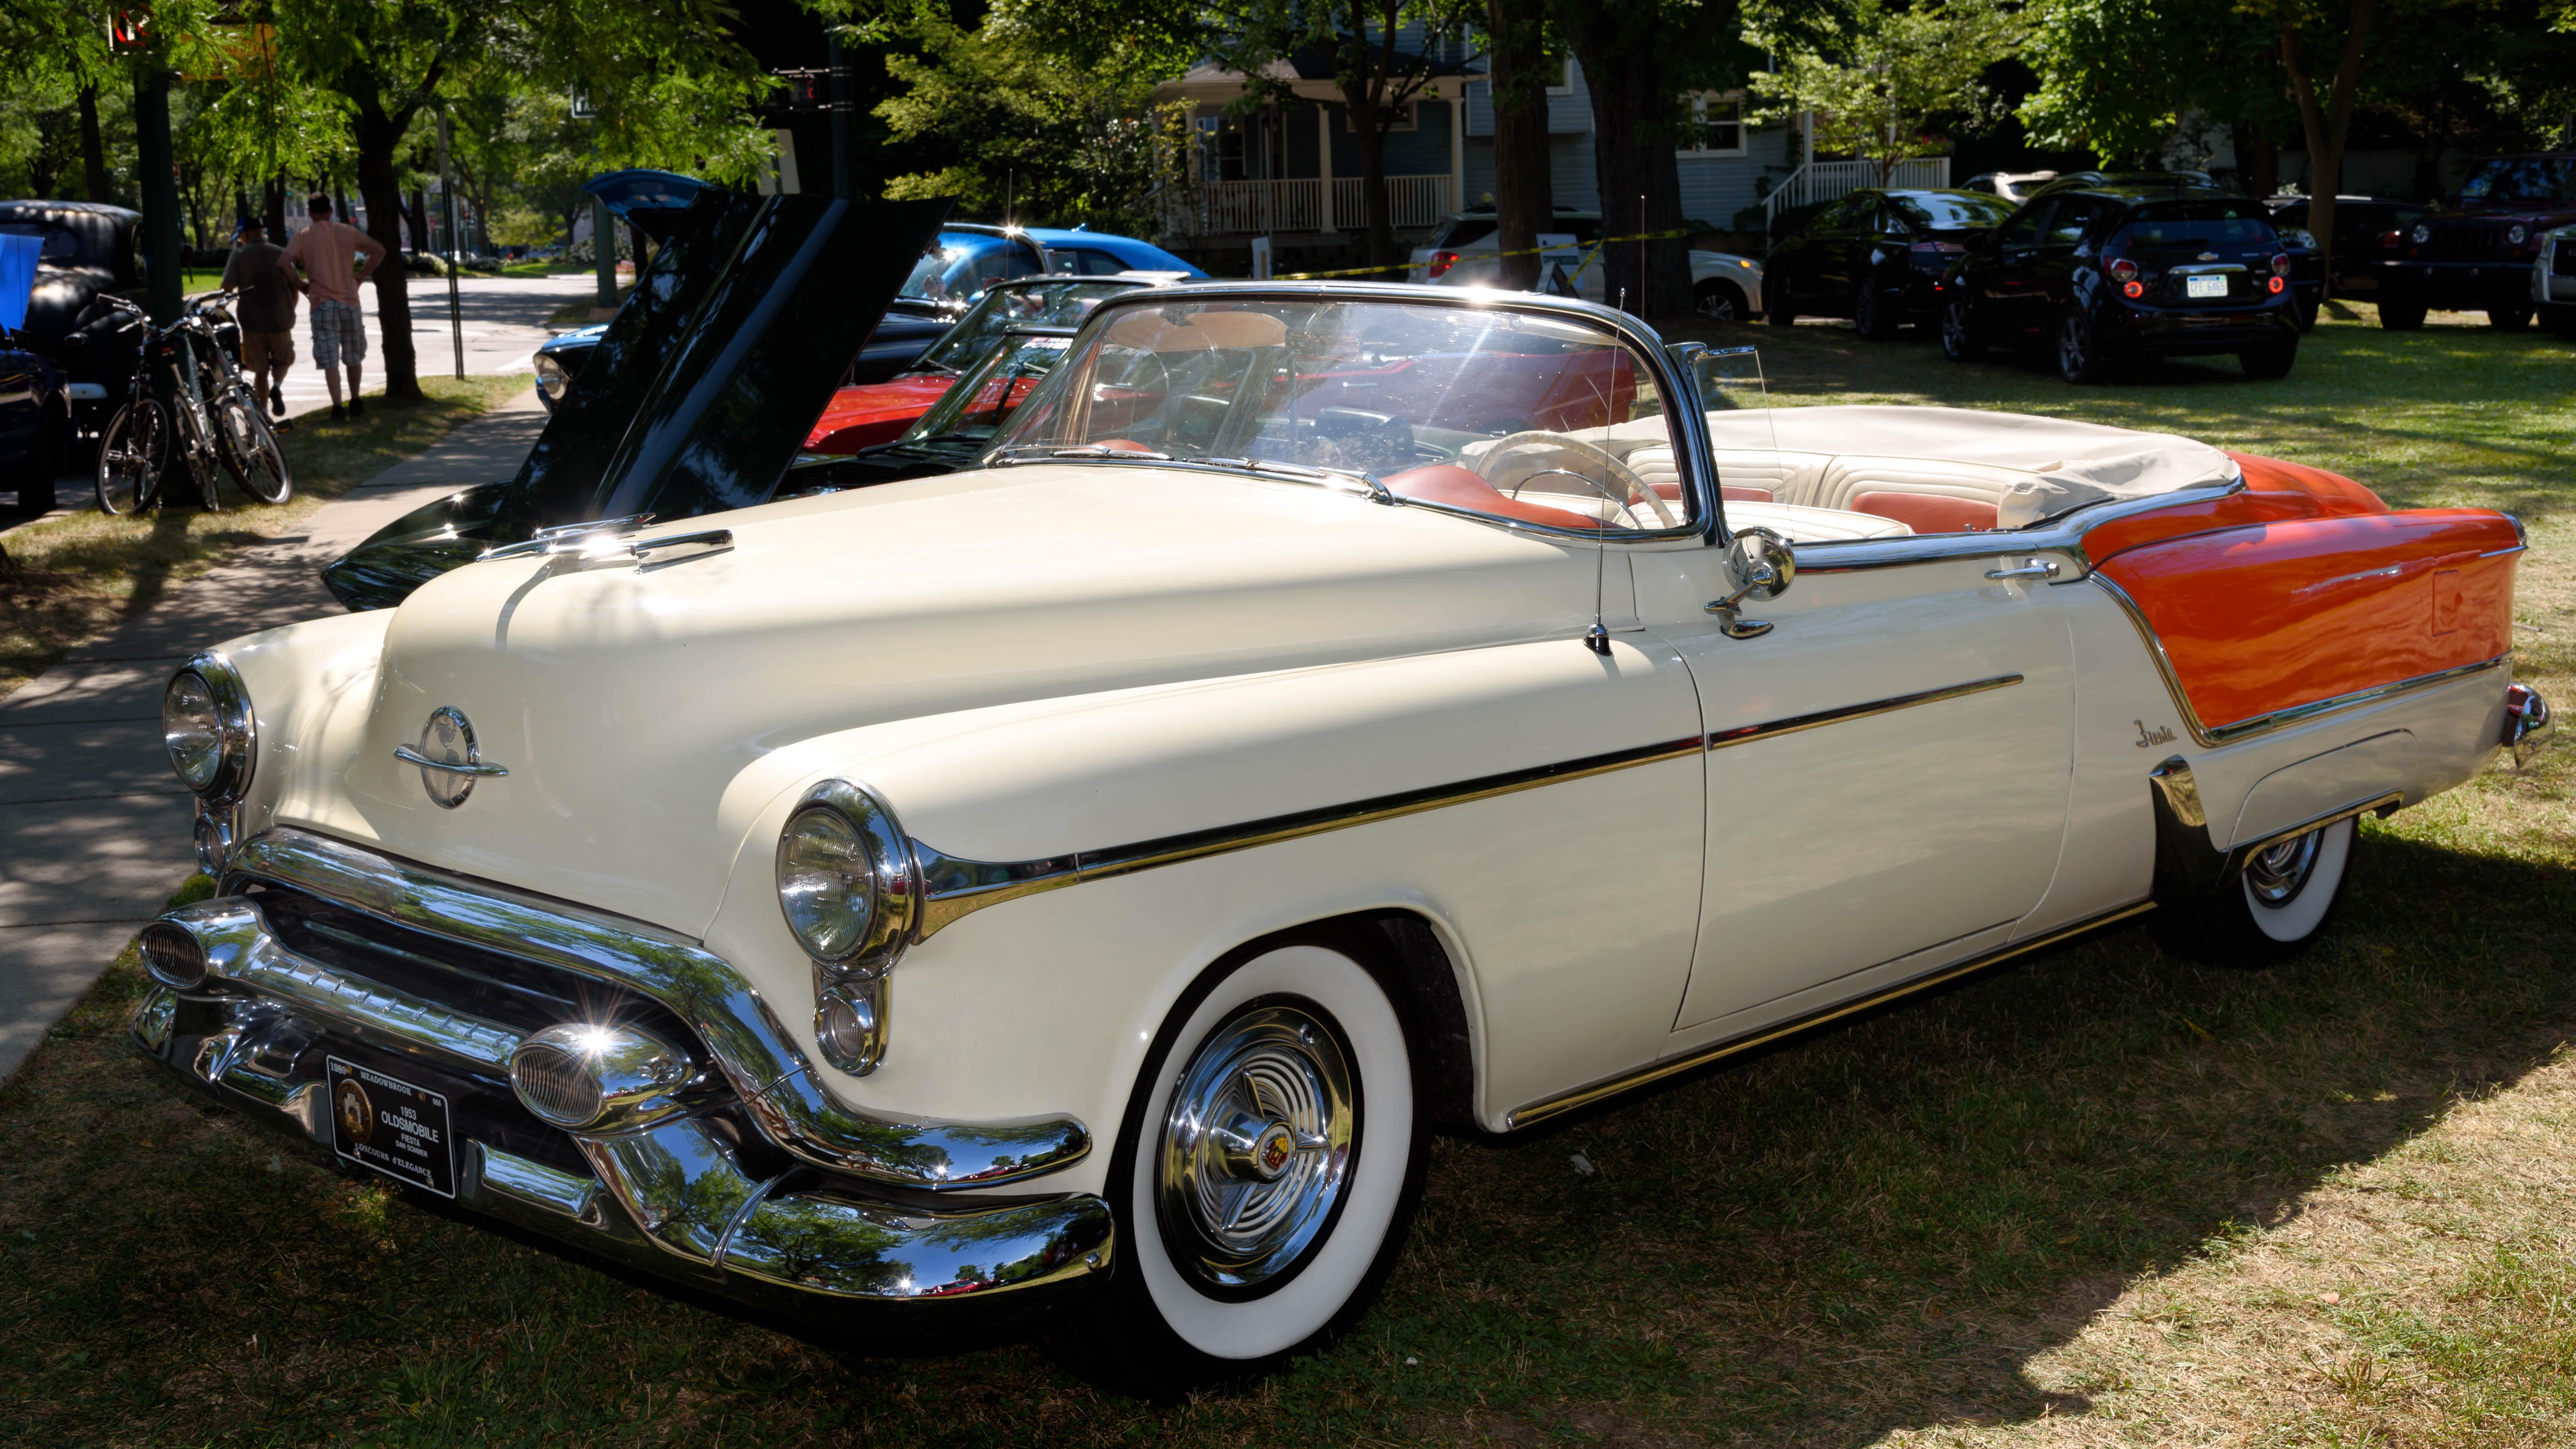 1953 Oldsmobile Ninety-Eight Fiesta Convertible, 2015, Nikon, Vehicle, Us, HQ Photo